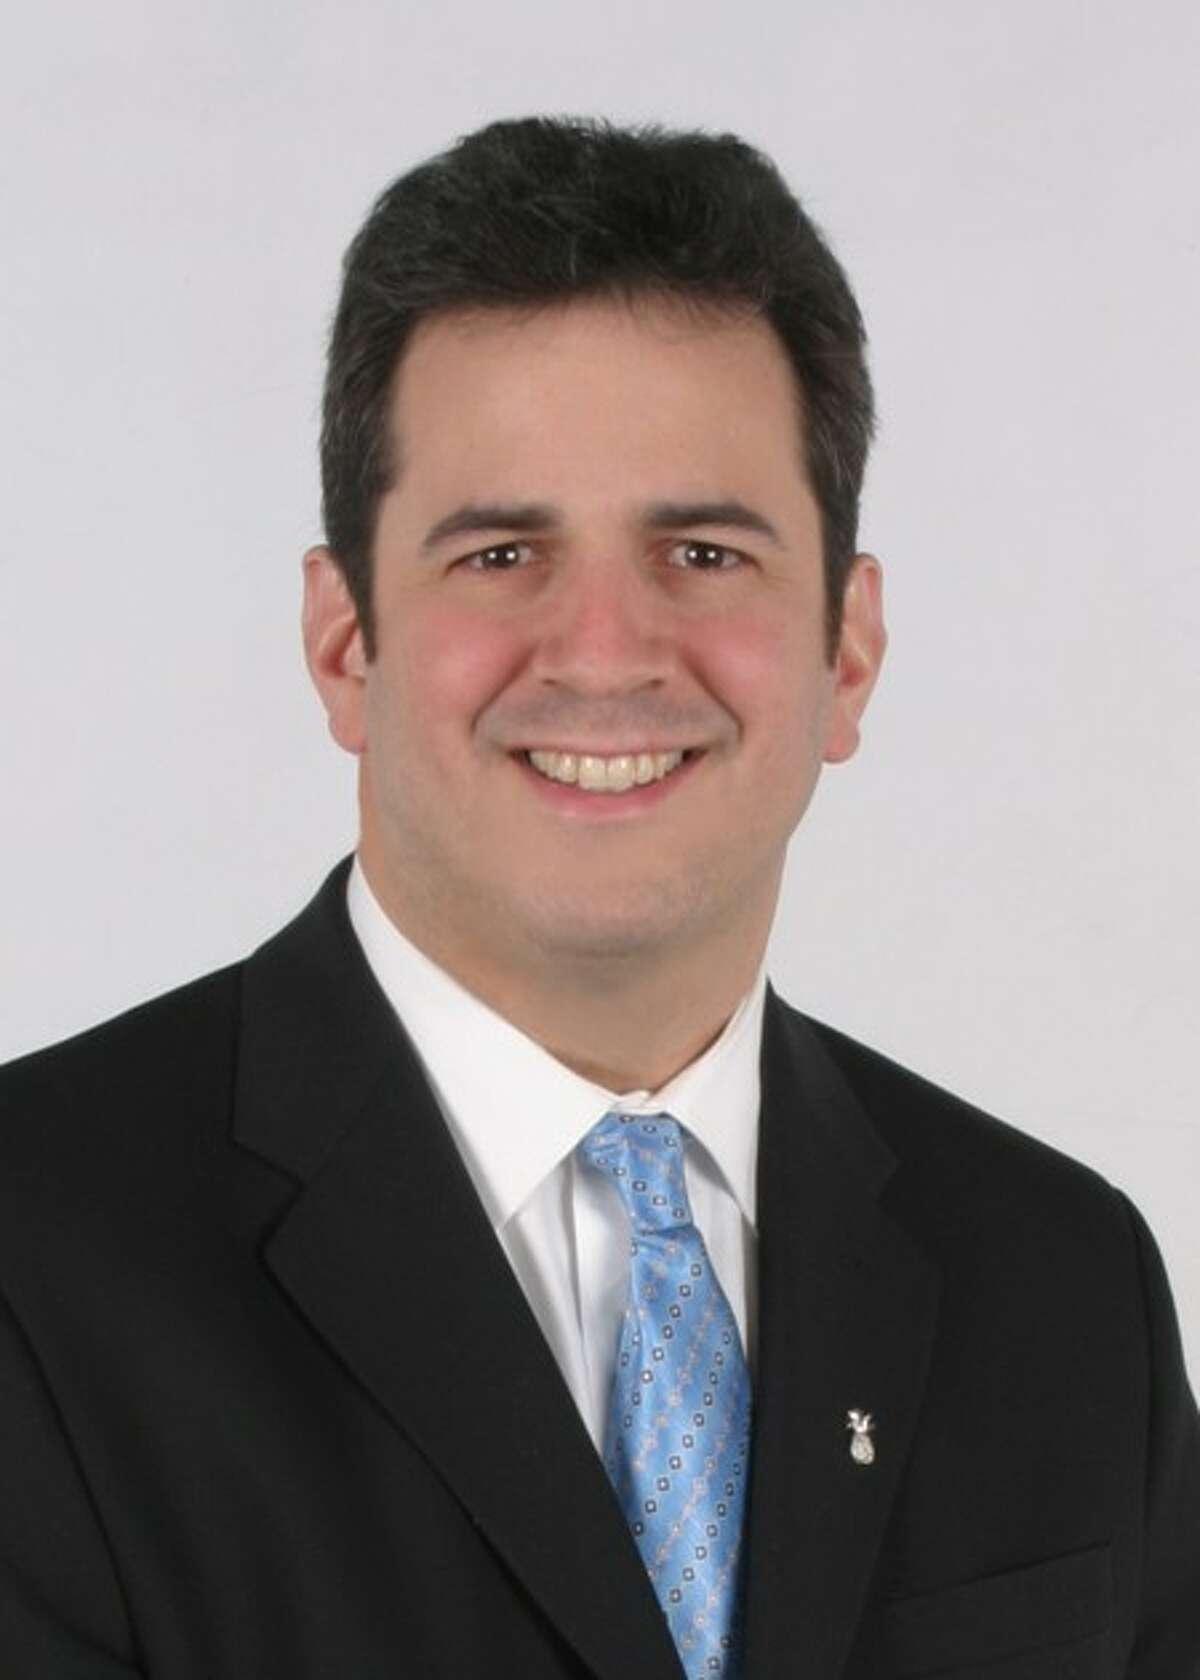 Perone named vice chairman of National State Legislators' Committee